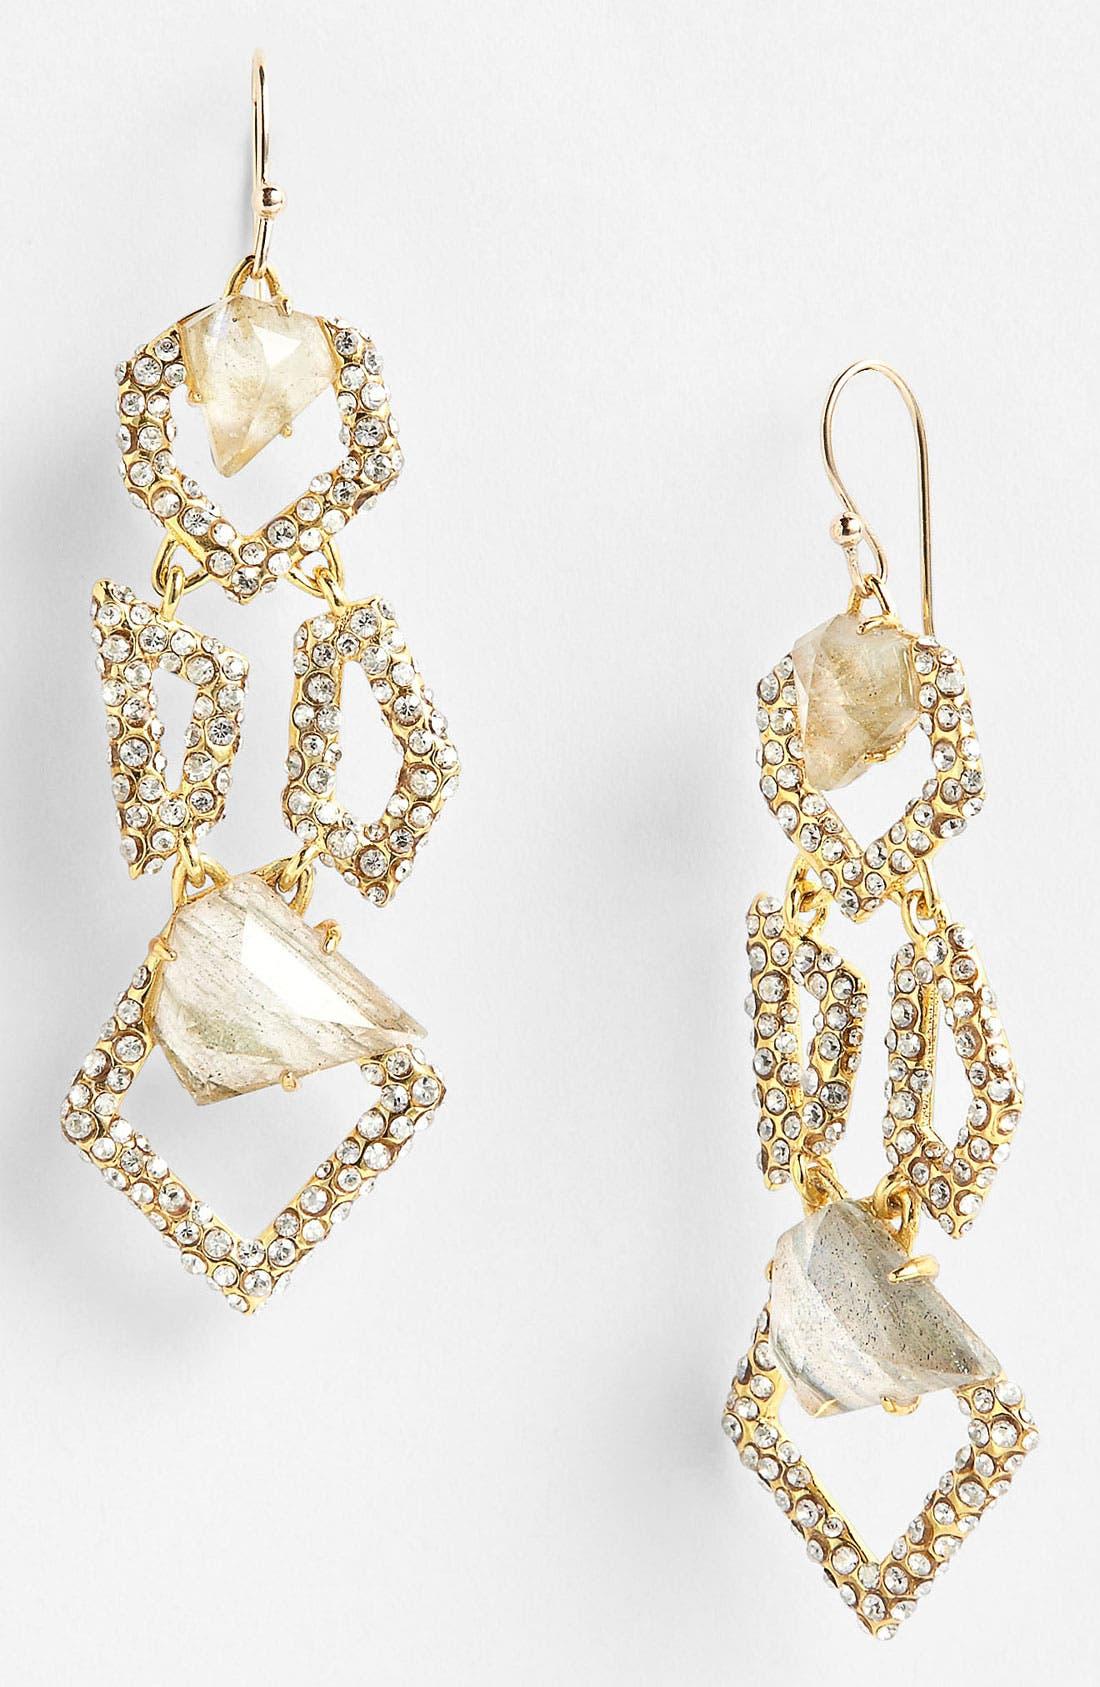 Alternate Image 1 Selected - Alexis Bittar 'Miss Havisham - New Wave' Drop Earrings